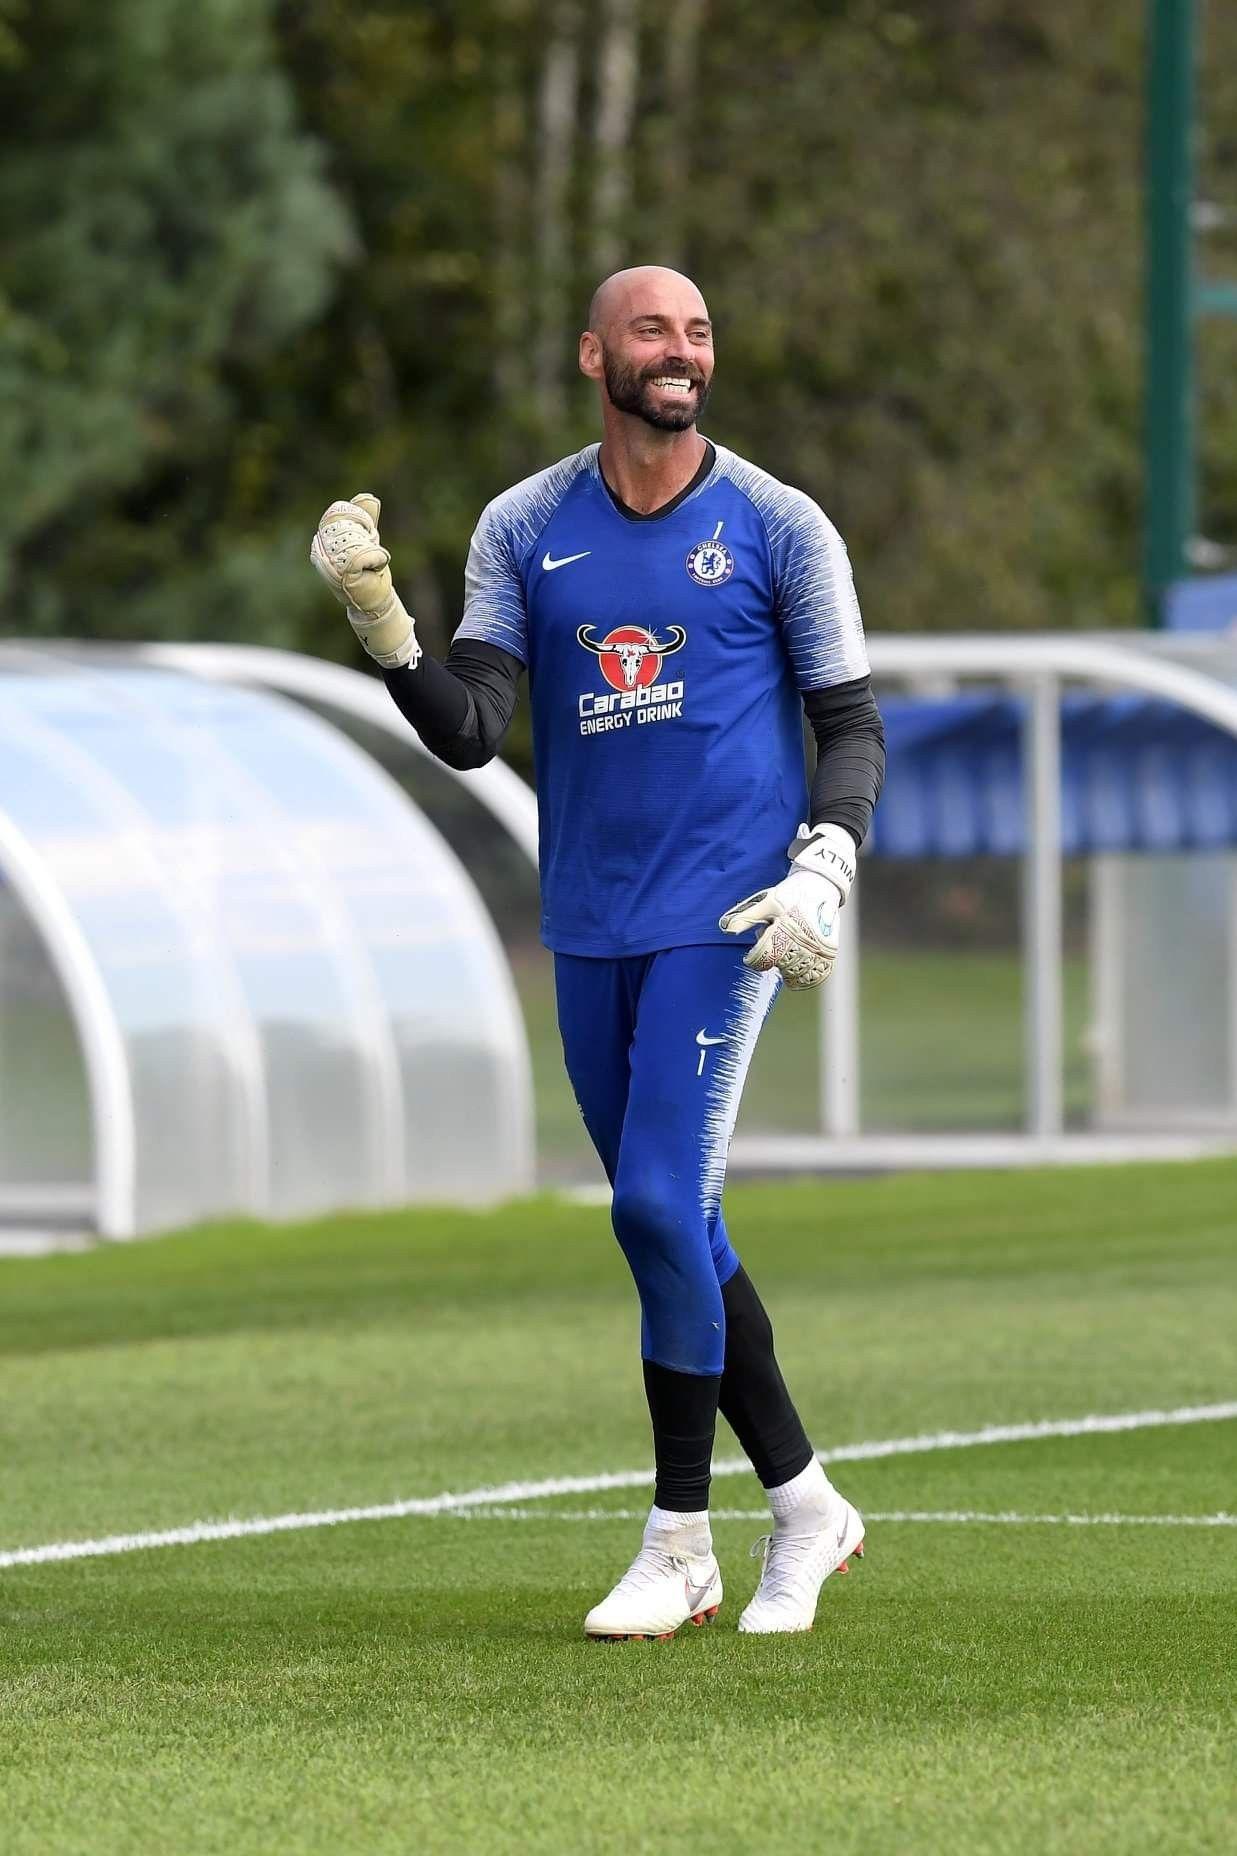 Pin on CHELSEA F.C. 2018/19 PHOTOS